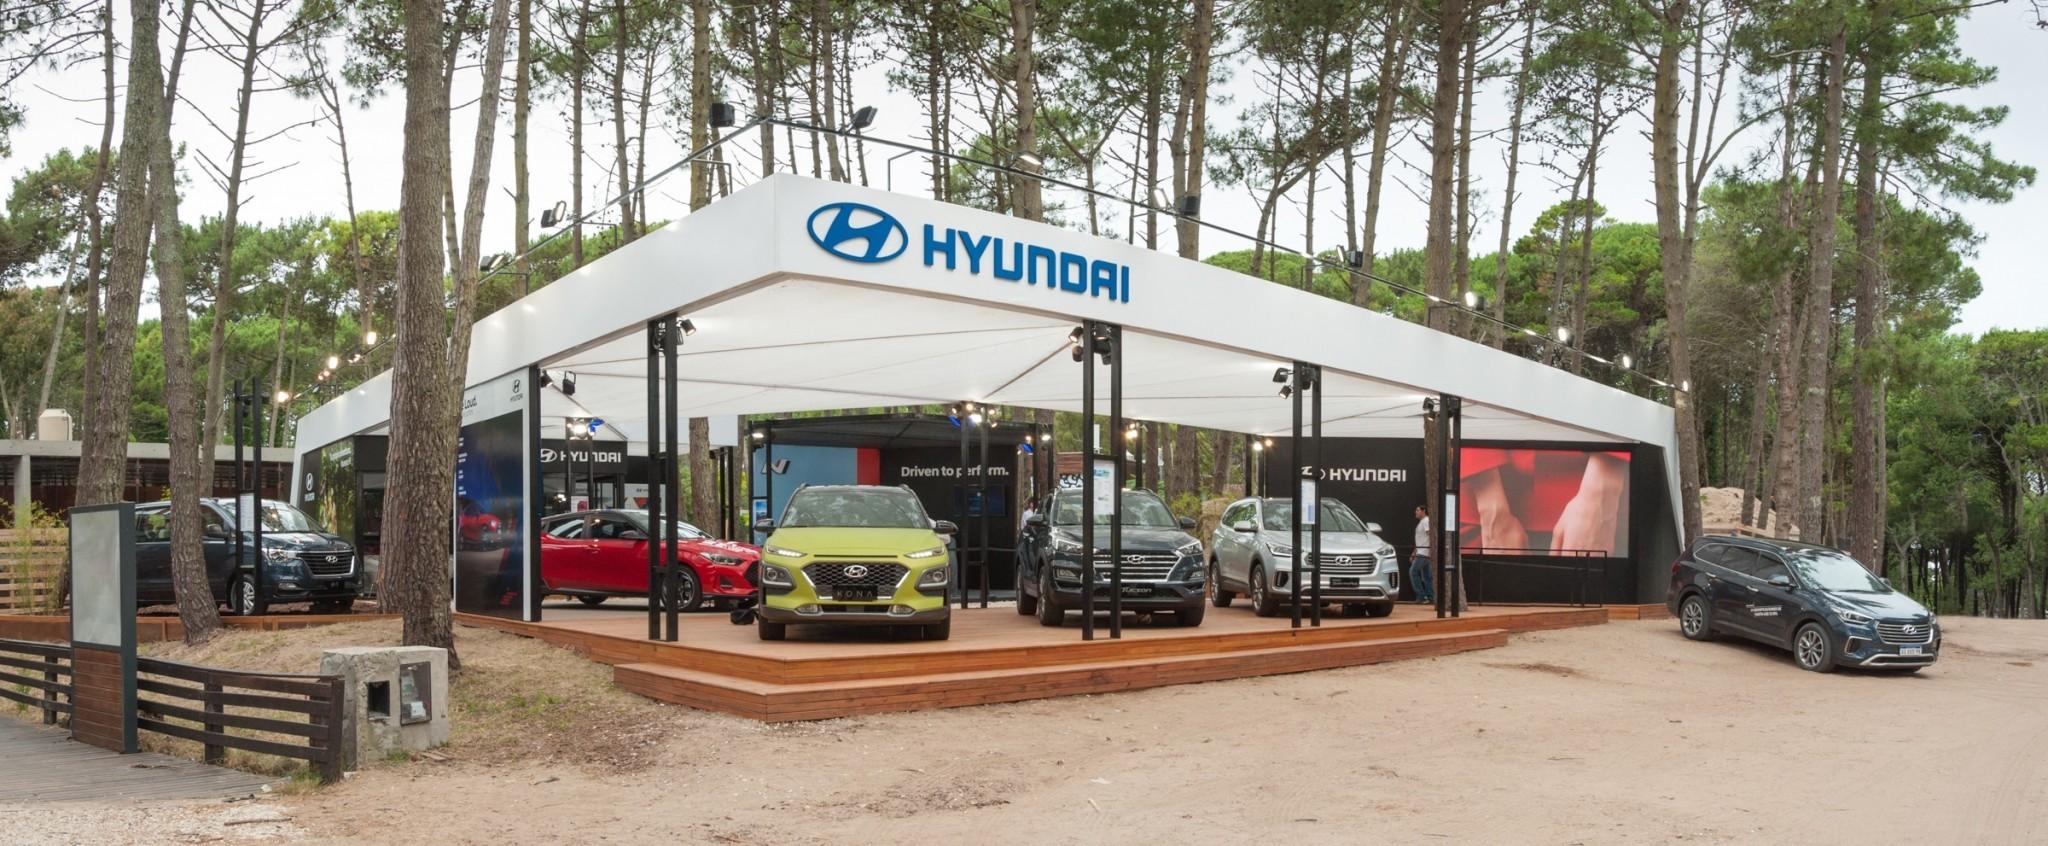 Stand Hyundai Carilo 2019-10